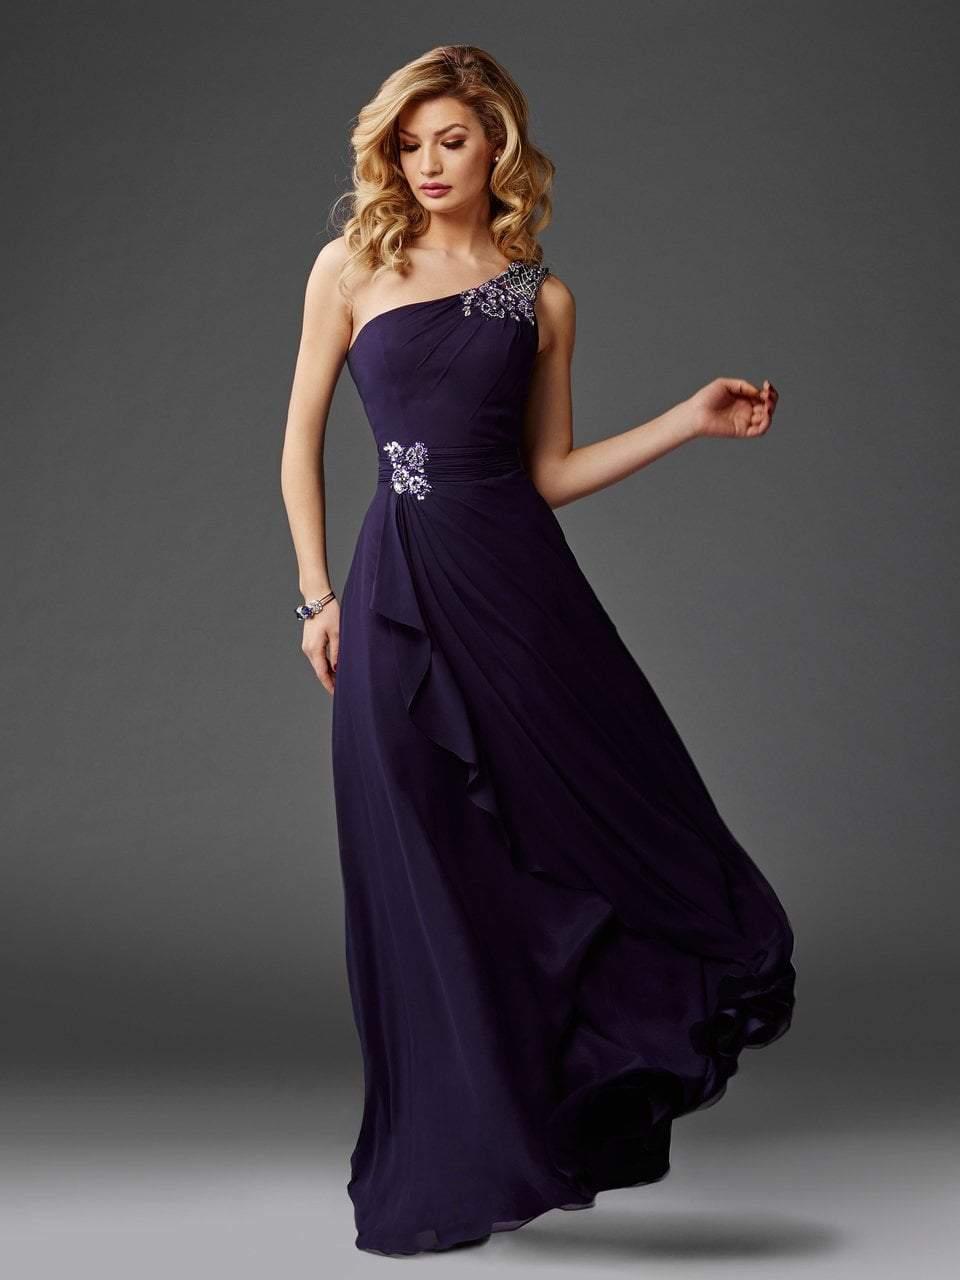 Clarisse - M6403 Draped Ornate Asymmetrical Gown